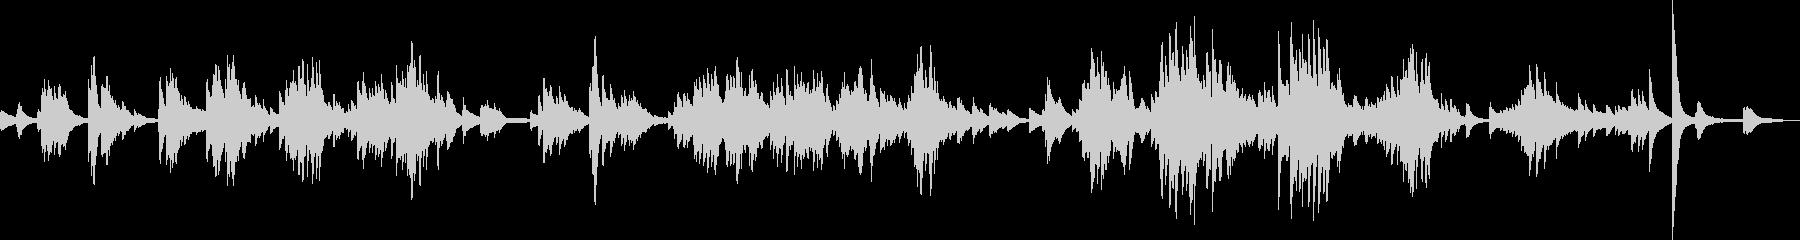 A sad and moody piano solo's unreproduced waveform